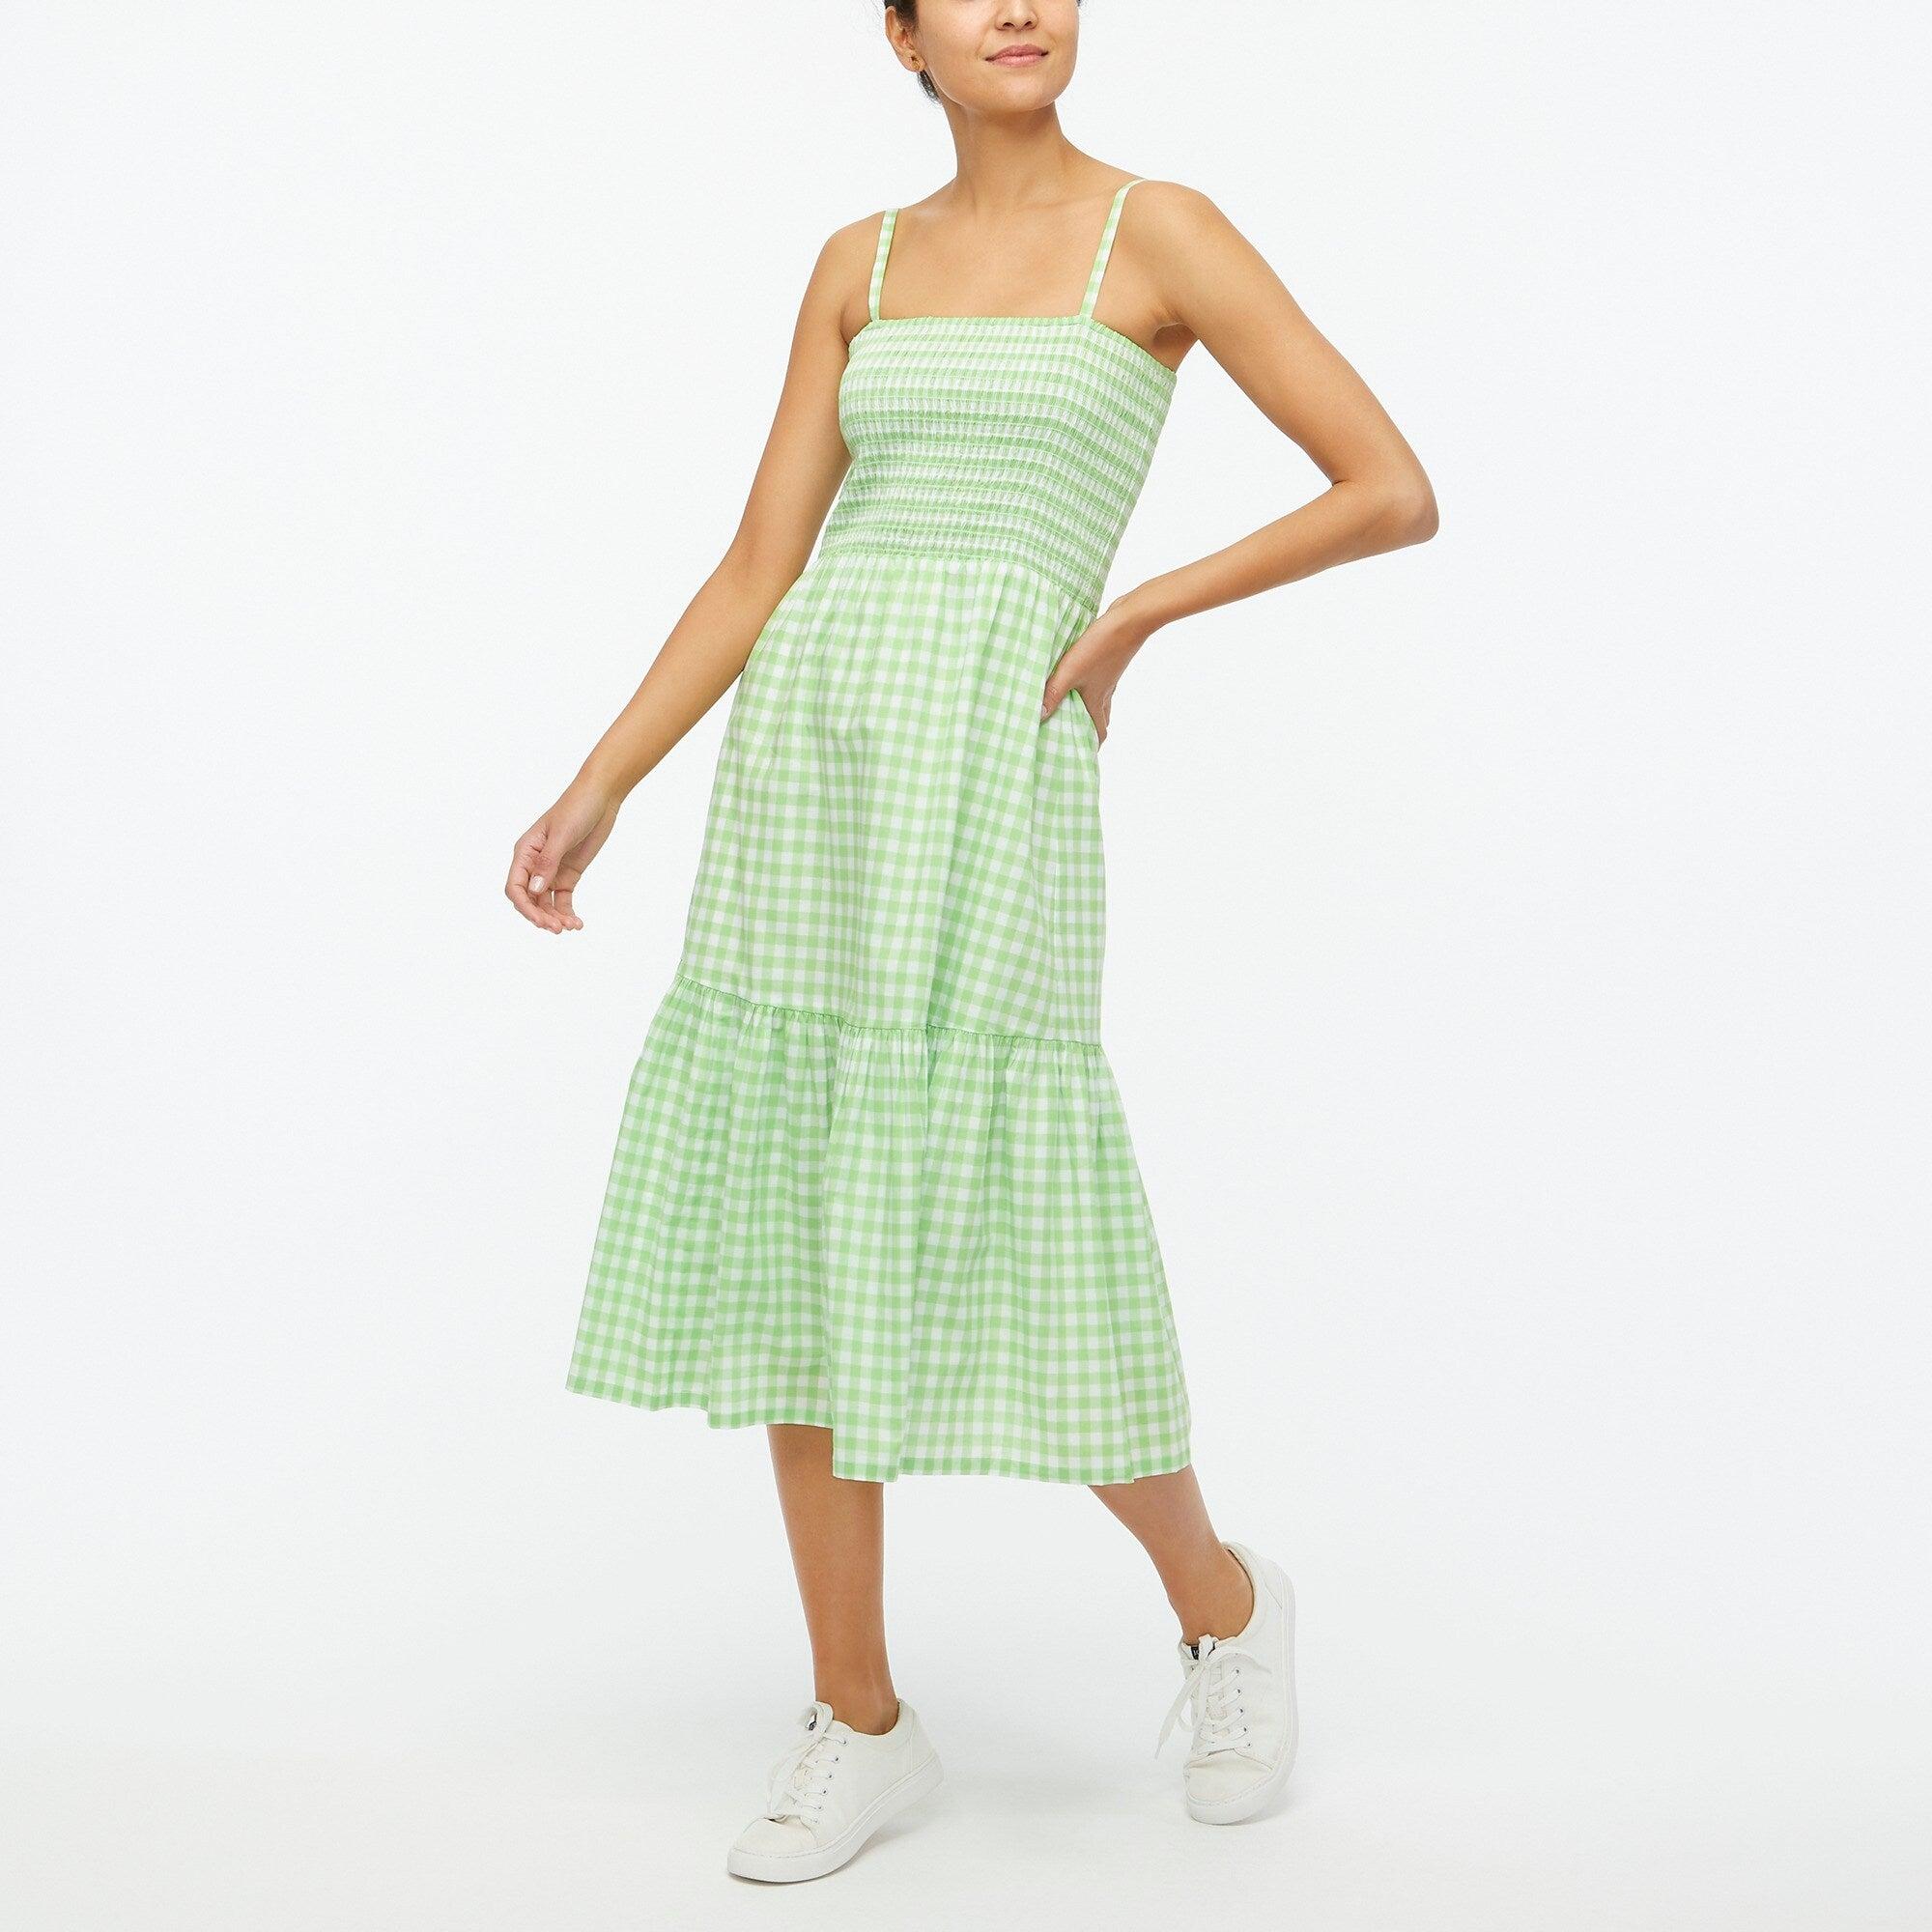 model in light green spaghetti strap dress